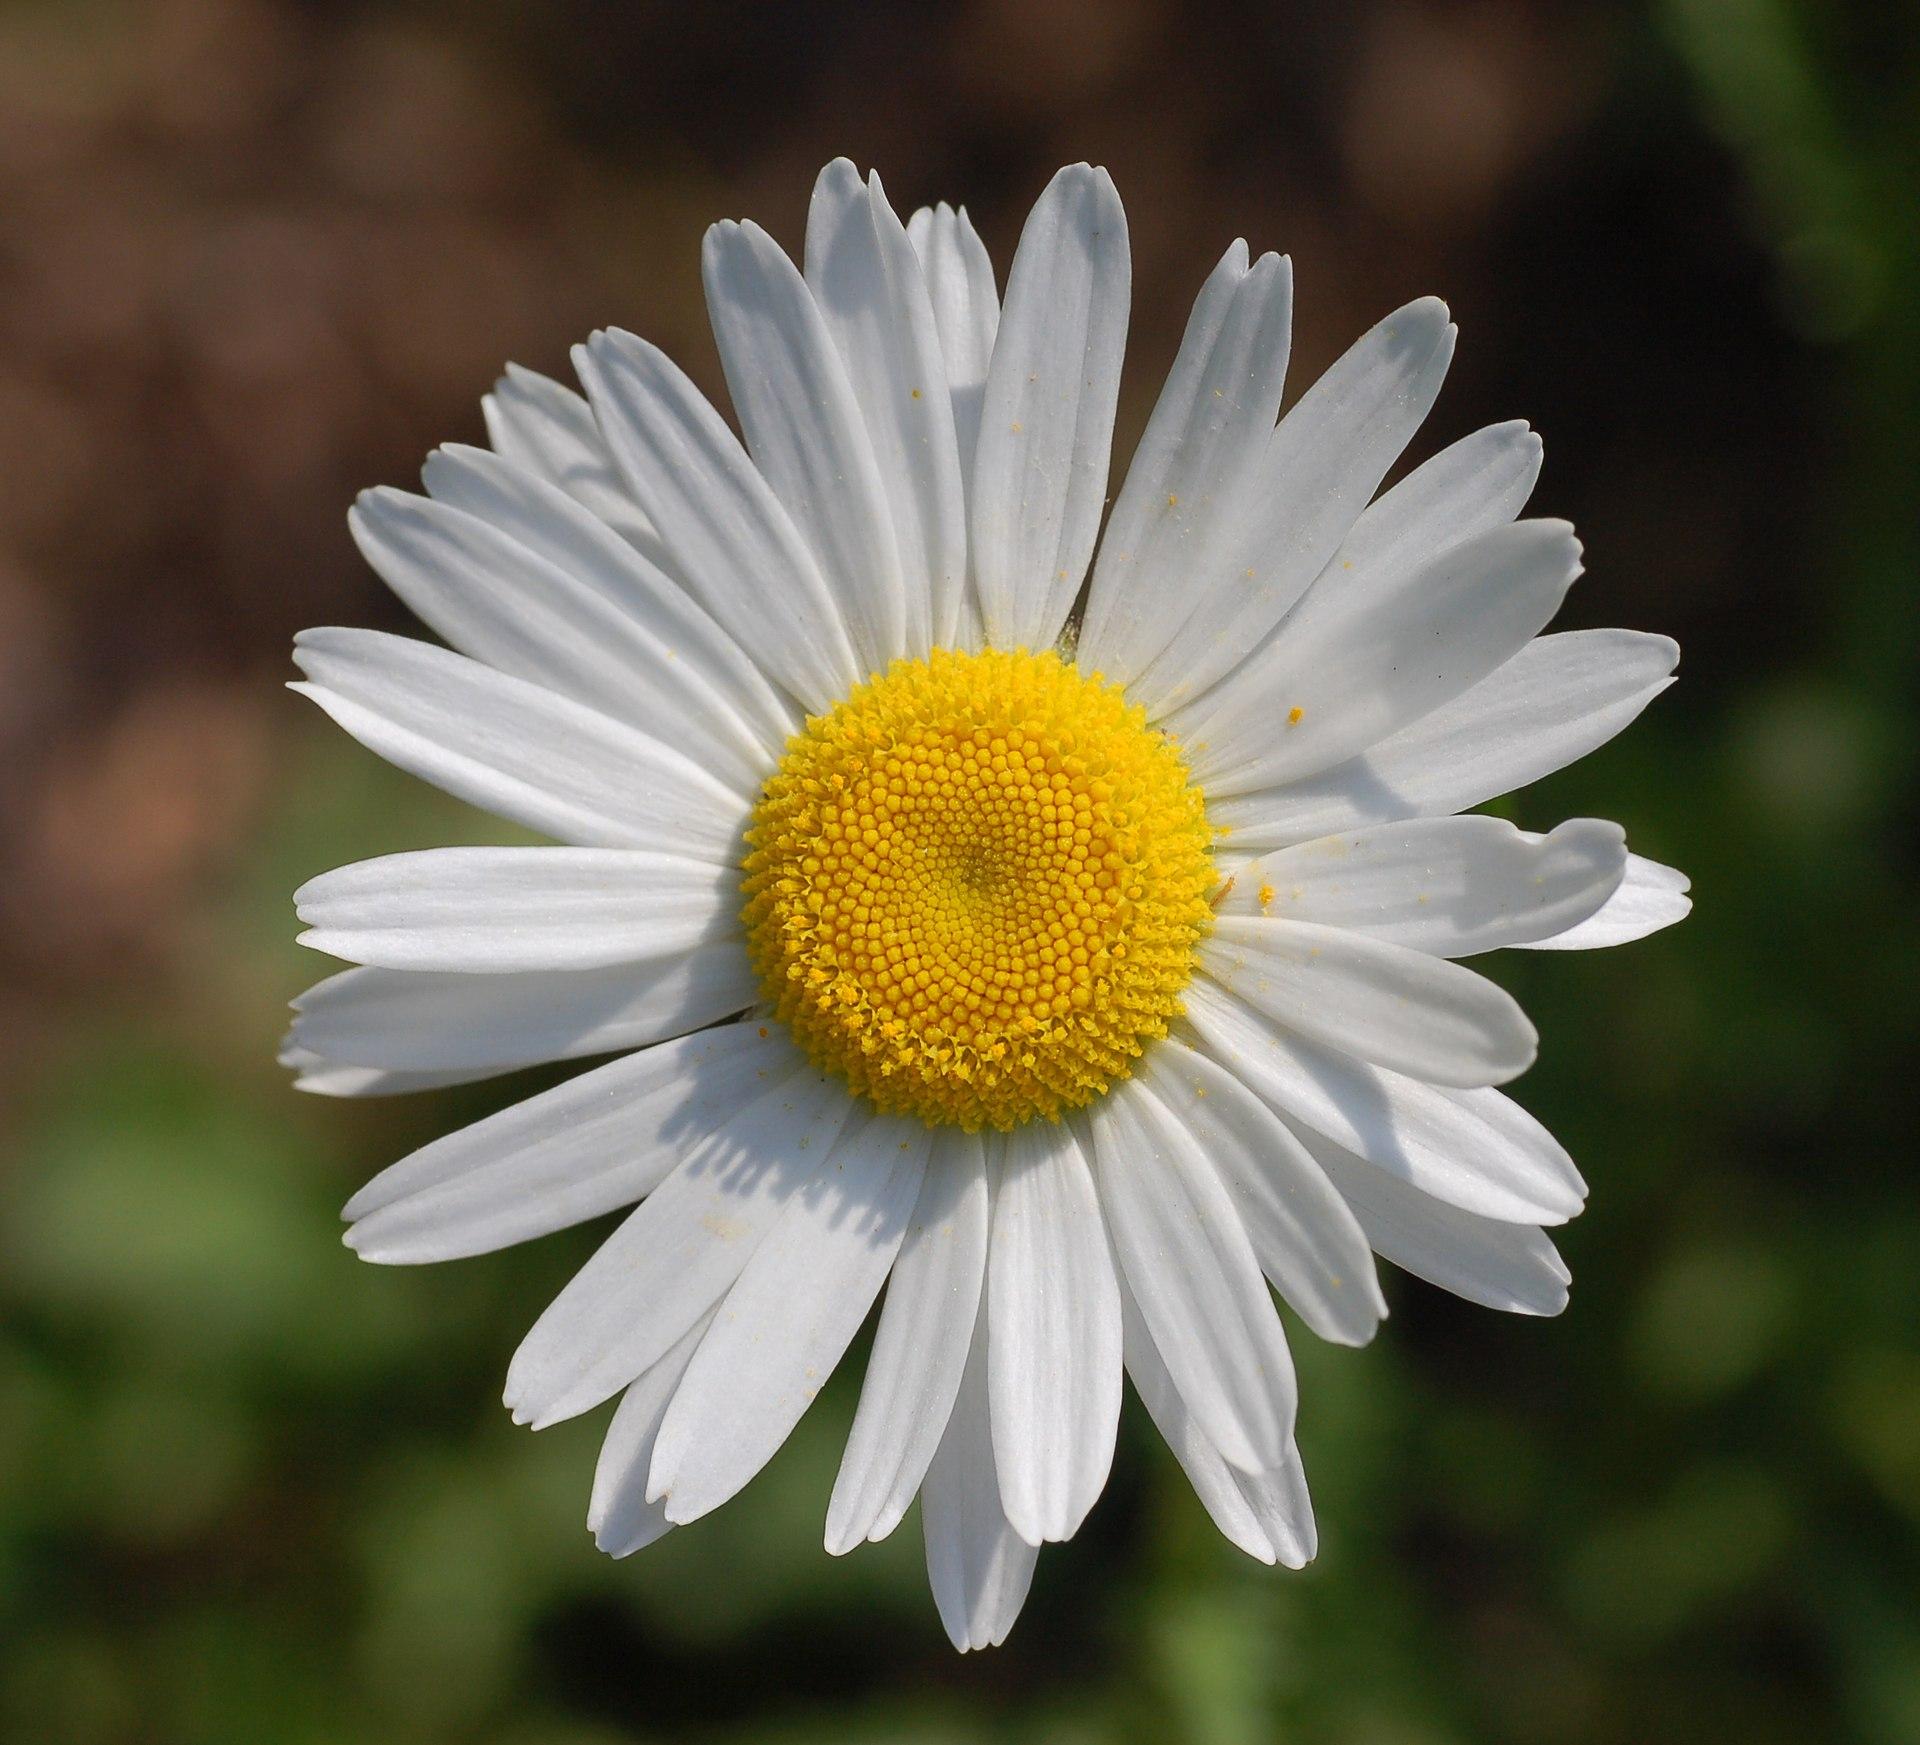 Prästkrage (blomma) âWikipedia